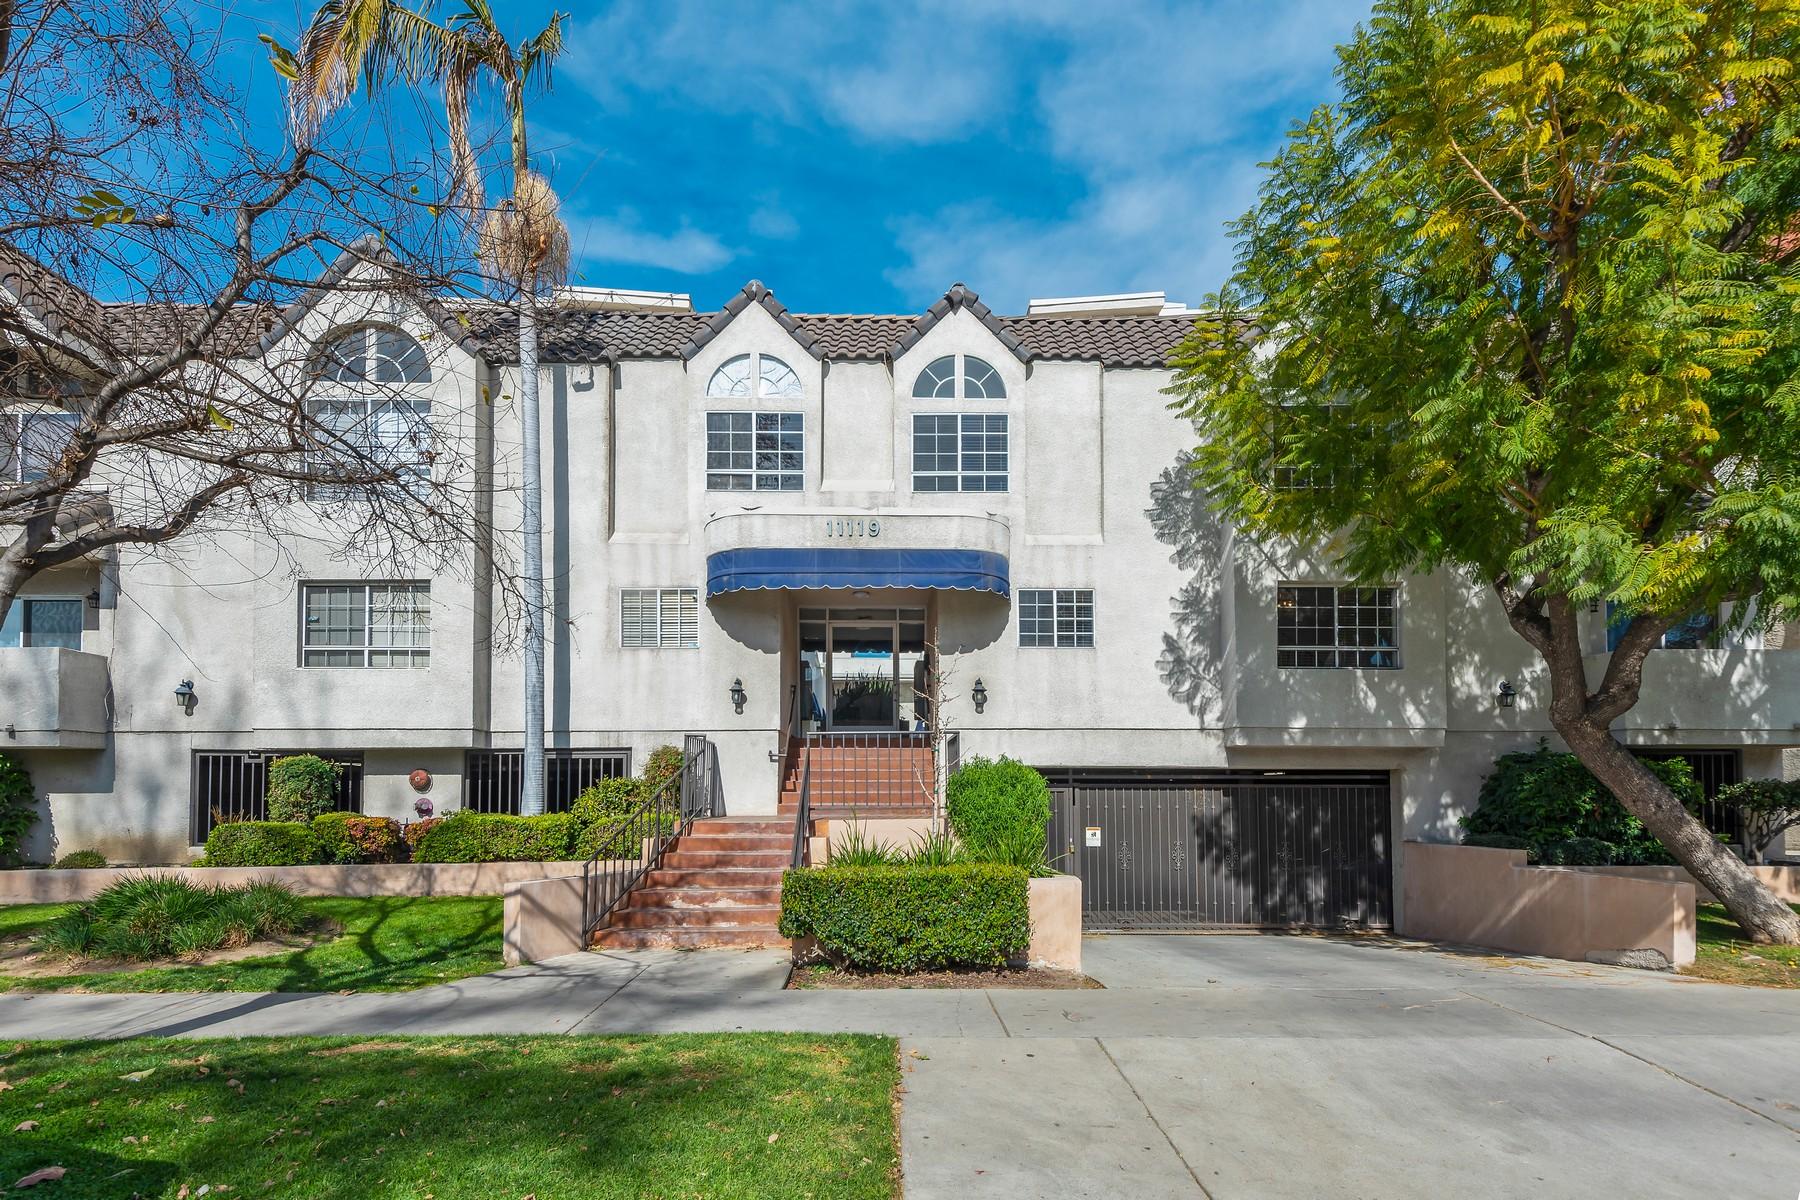 townhouses para Venda às FULLY REMODELED END UNIT! 11119 Camarillo Street Unit #101, North Hollywood, Califórnia 91602 Estados Unidos